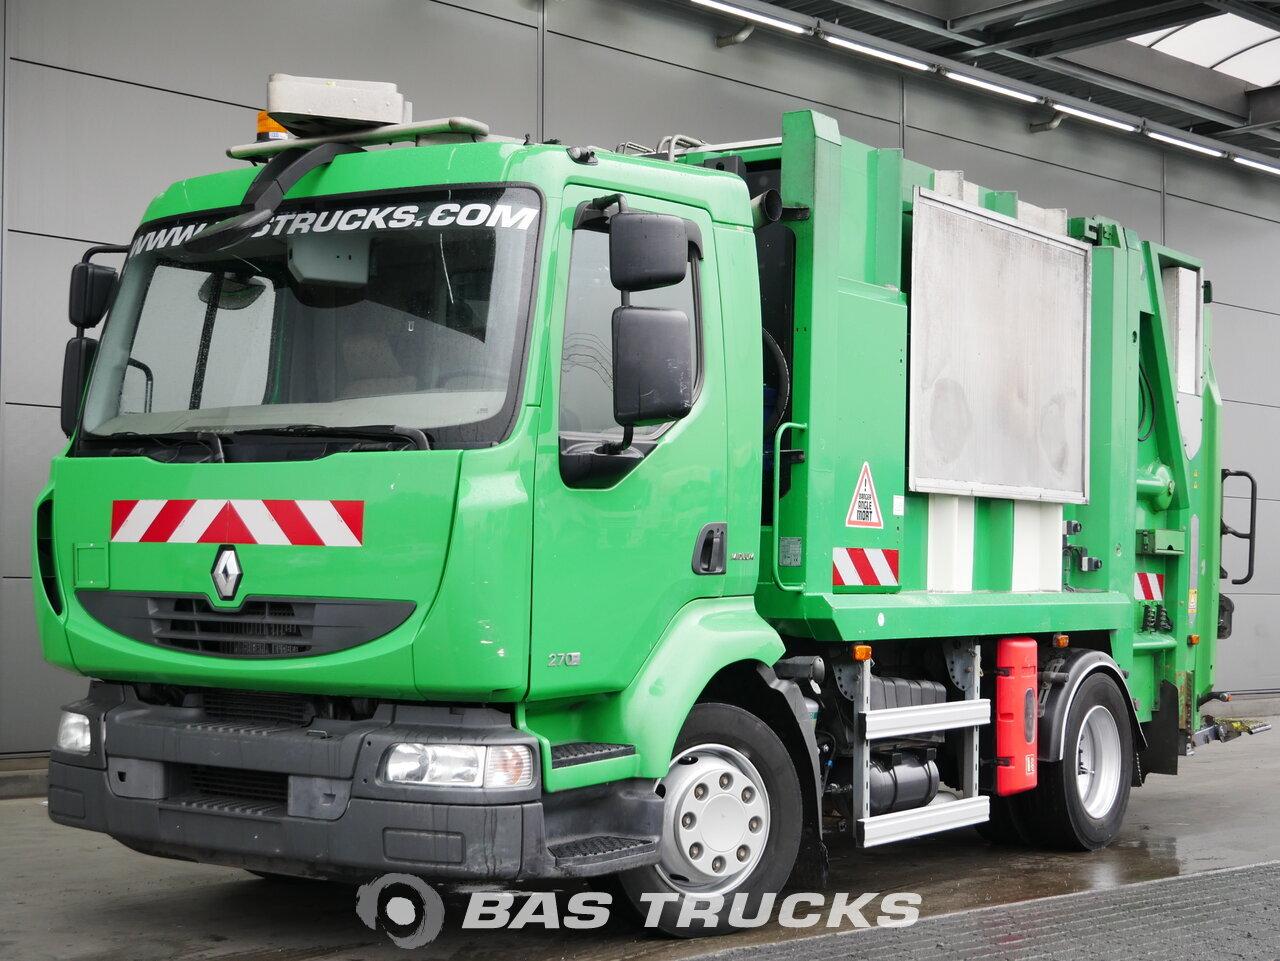 For sale at BAS Trucks: Renault Midlum 270 4X2 05/2010